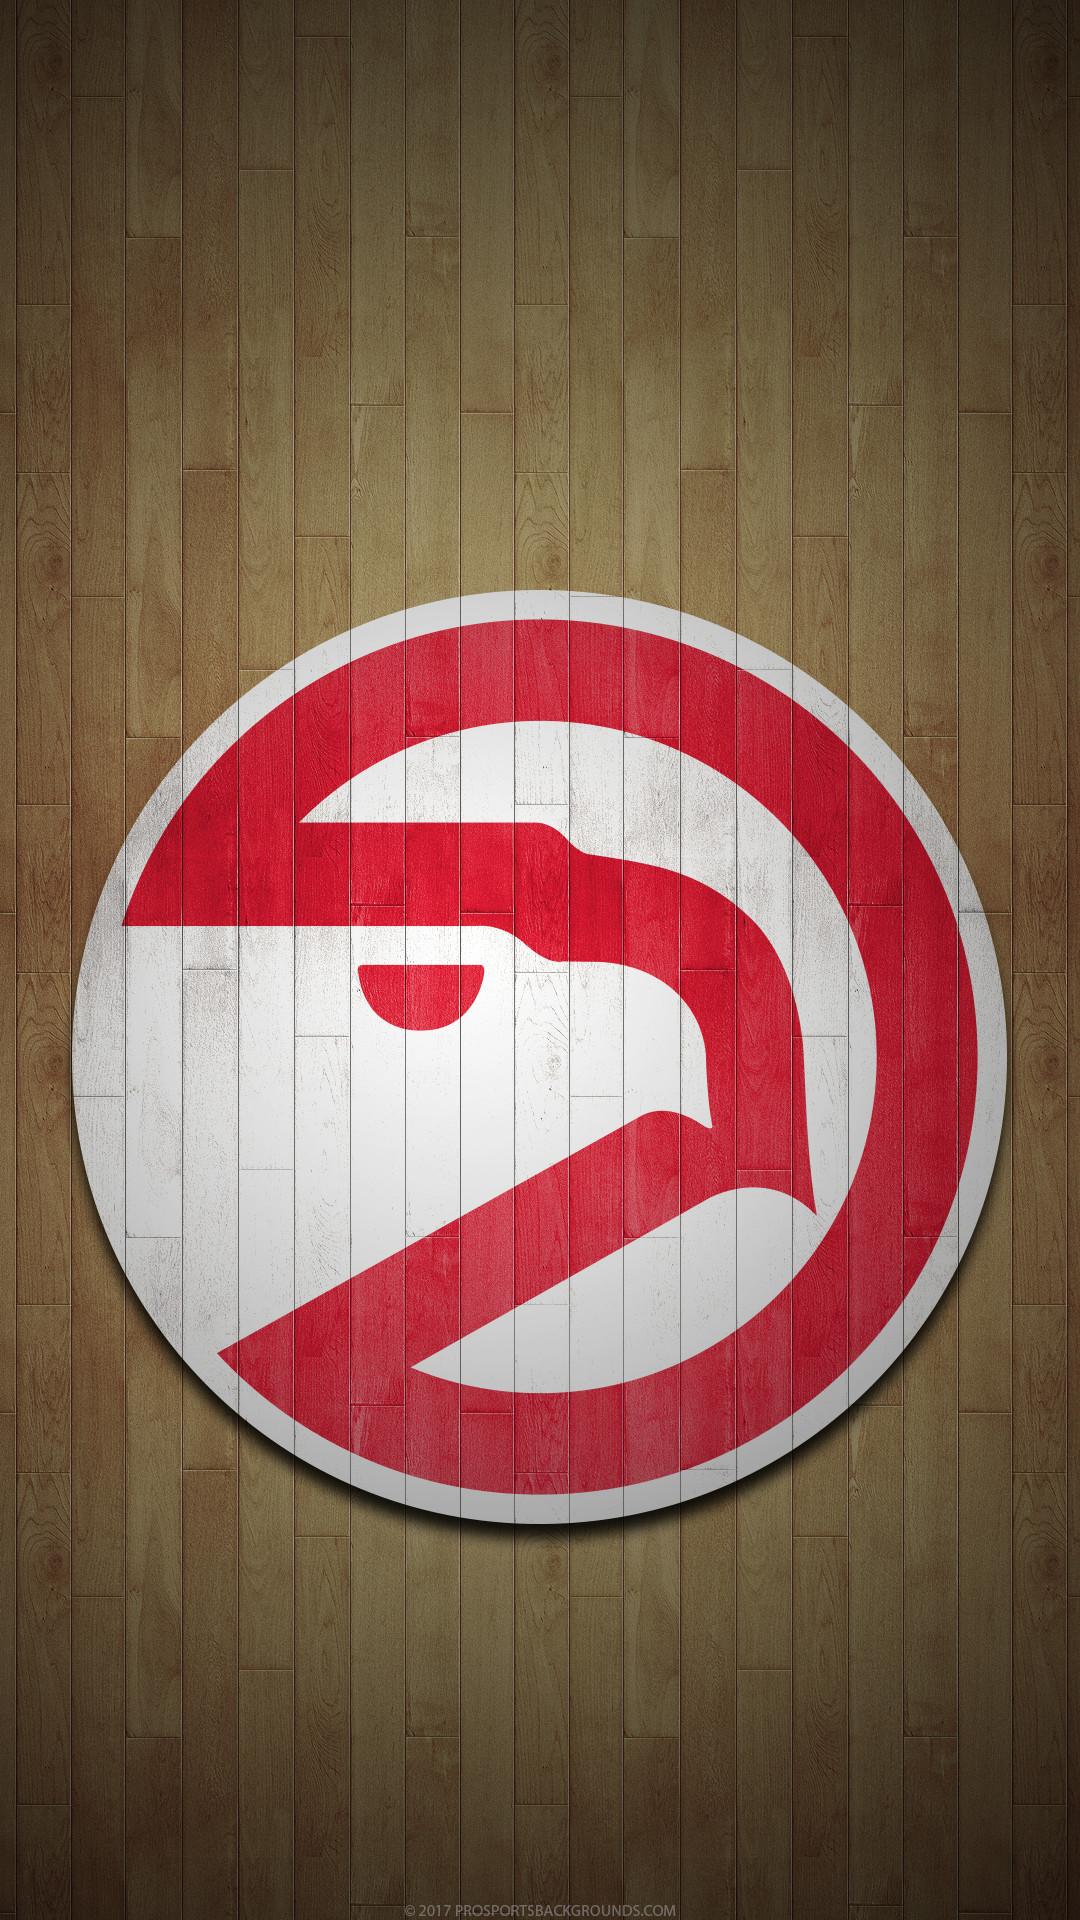 Atlanta Hawks 2017 Nba Basketball December Hardwood Schedule Wallpaper For Iphone Andriod And Windows